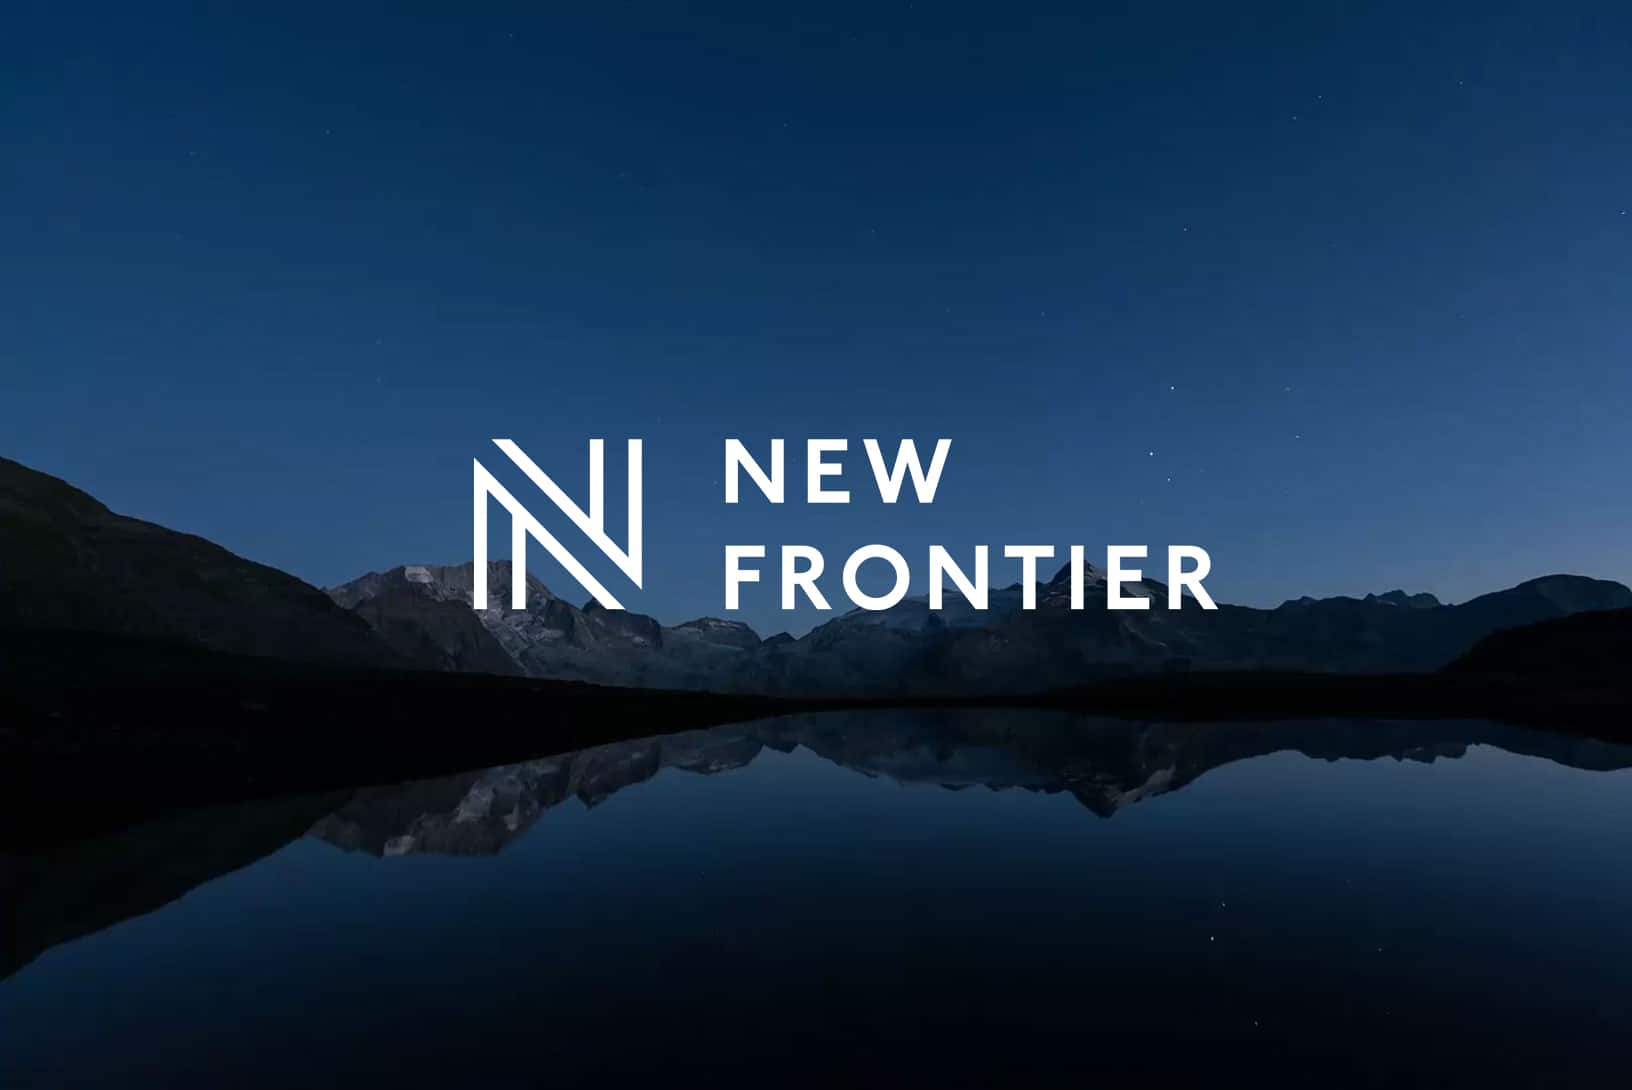 hospital stocks New frontier